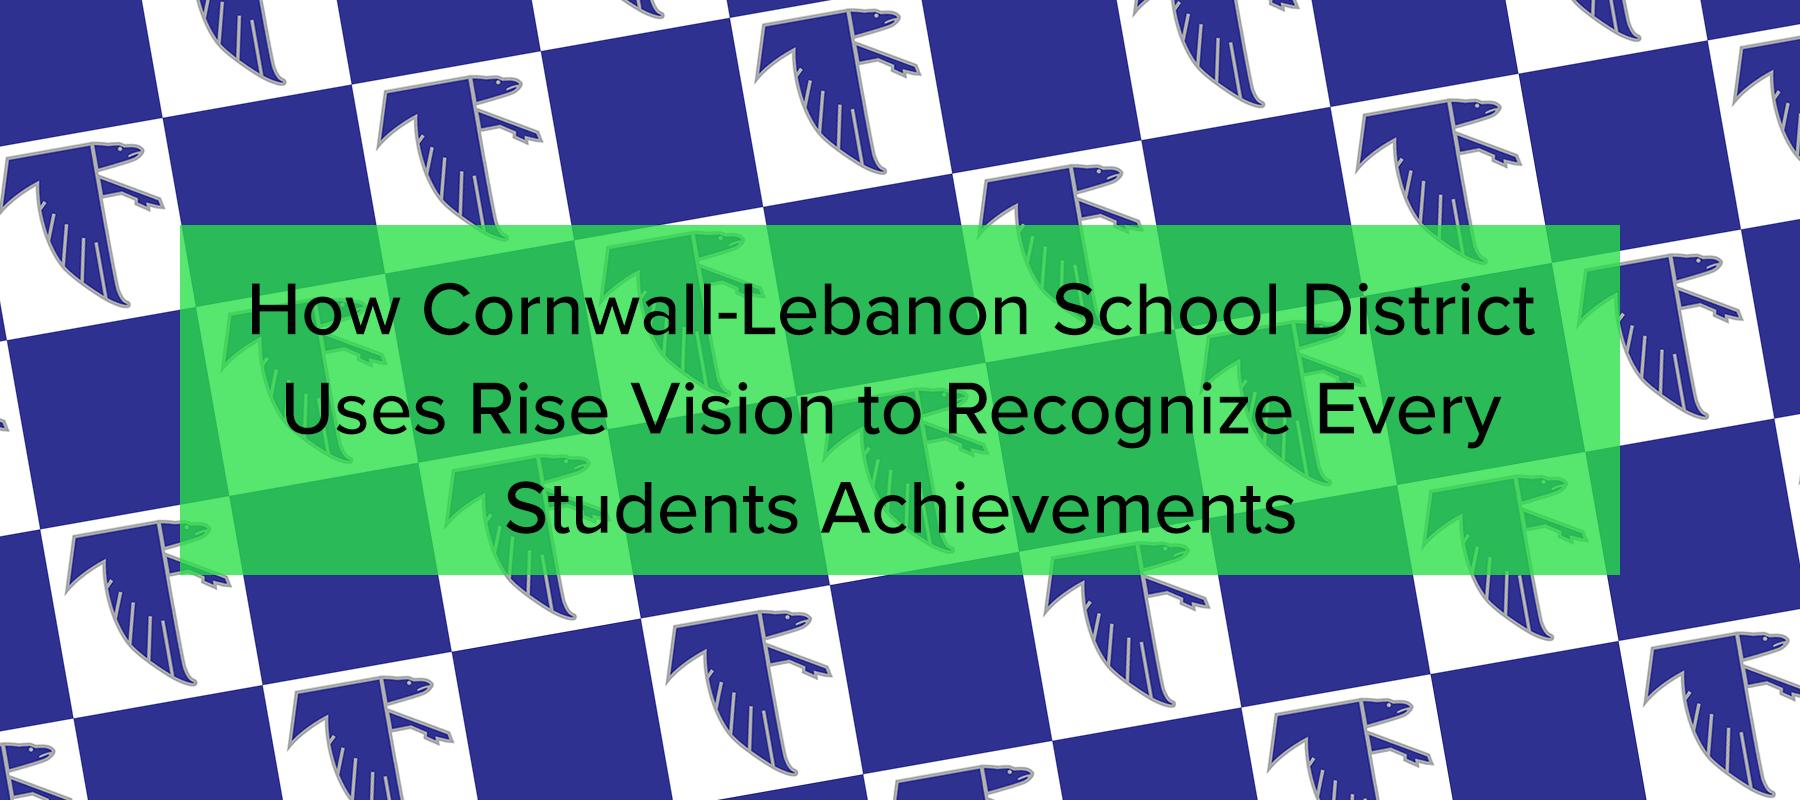 rise vision cornwall lebanon case study